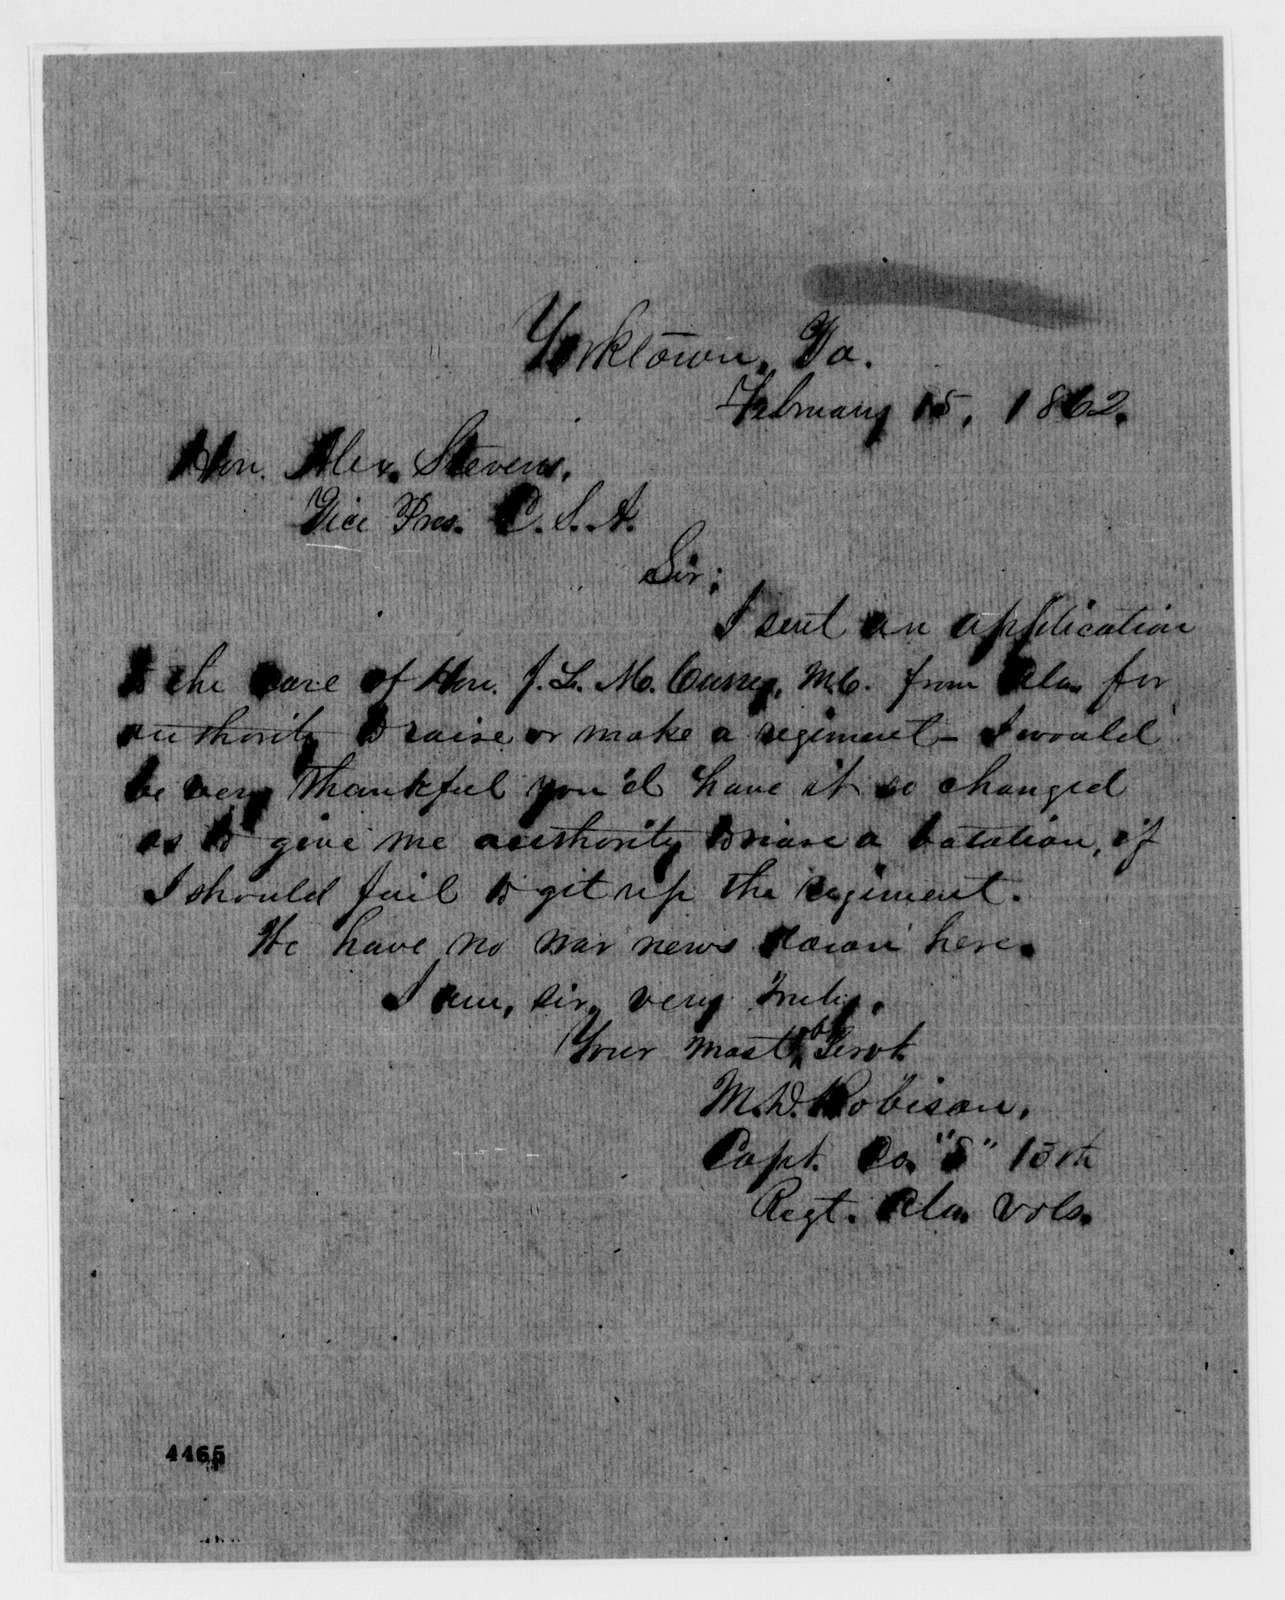 Alexander Hamilton Stephens Papers: General Correspondence, 1784-1886; 1862, Feb. 2-23